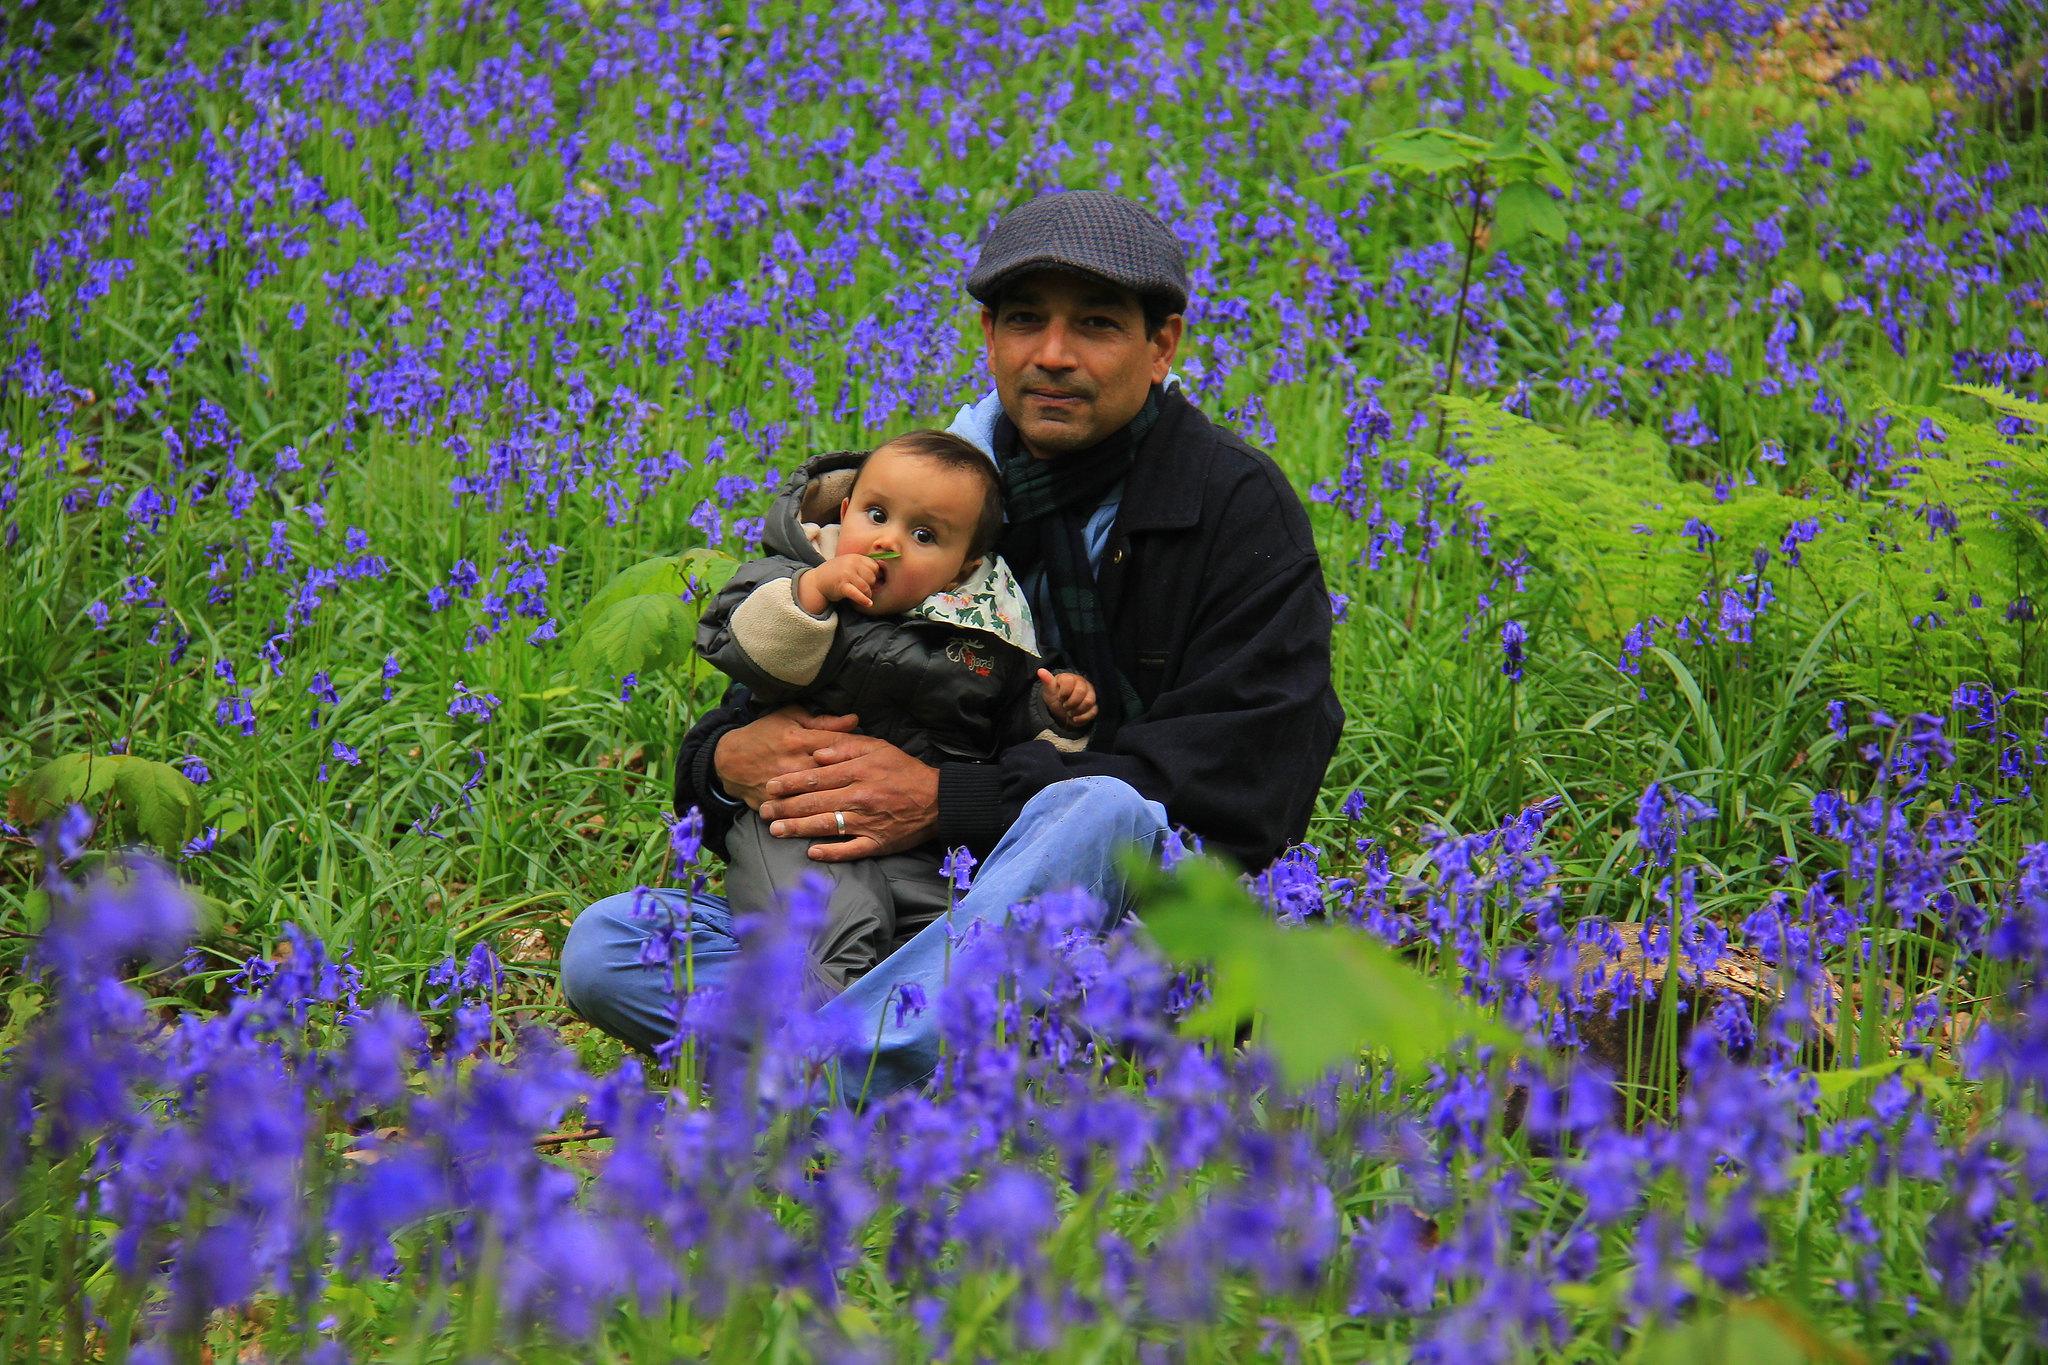 hallerbos blue forest is best visited in april